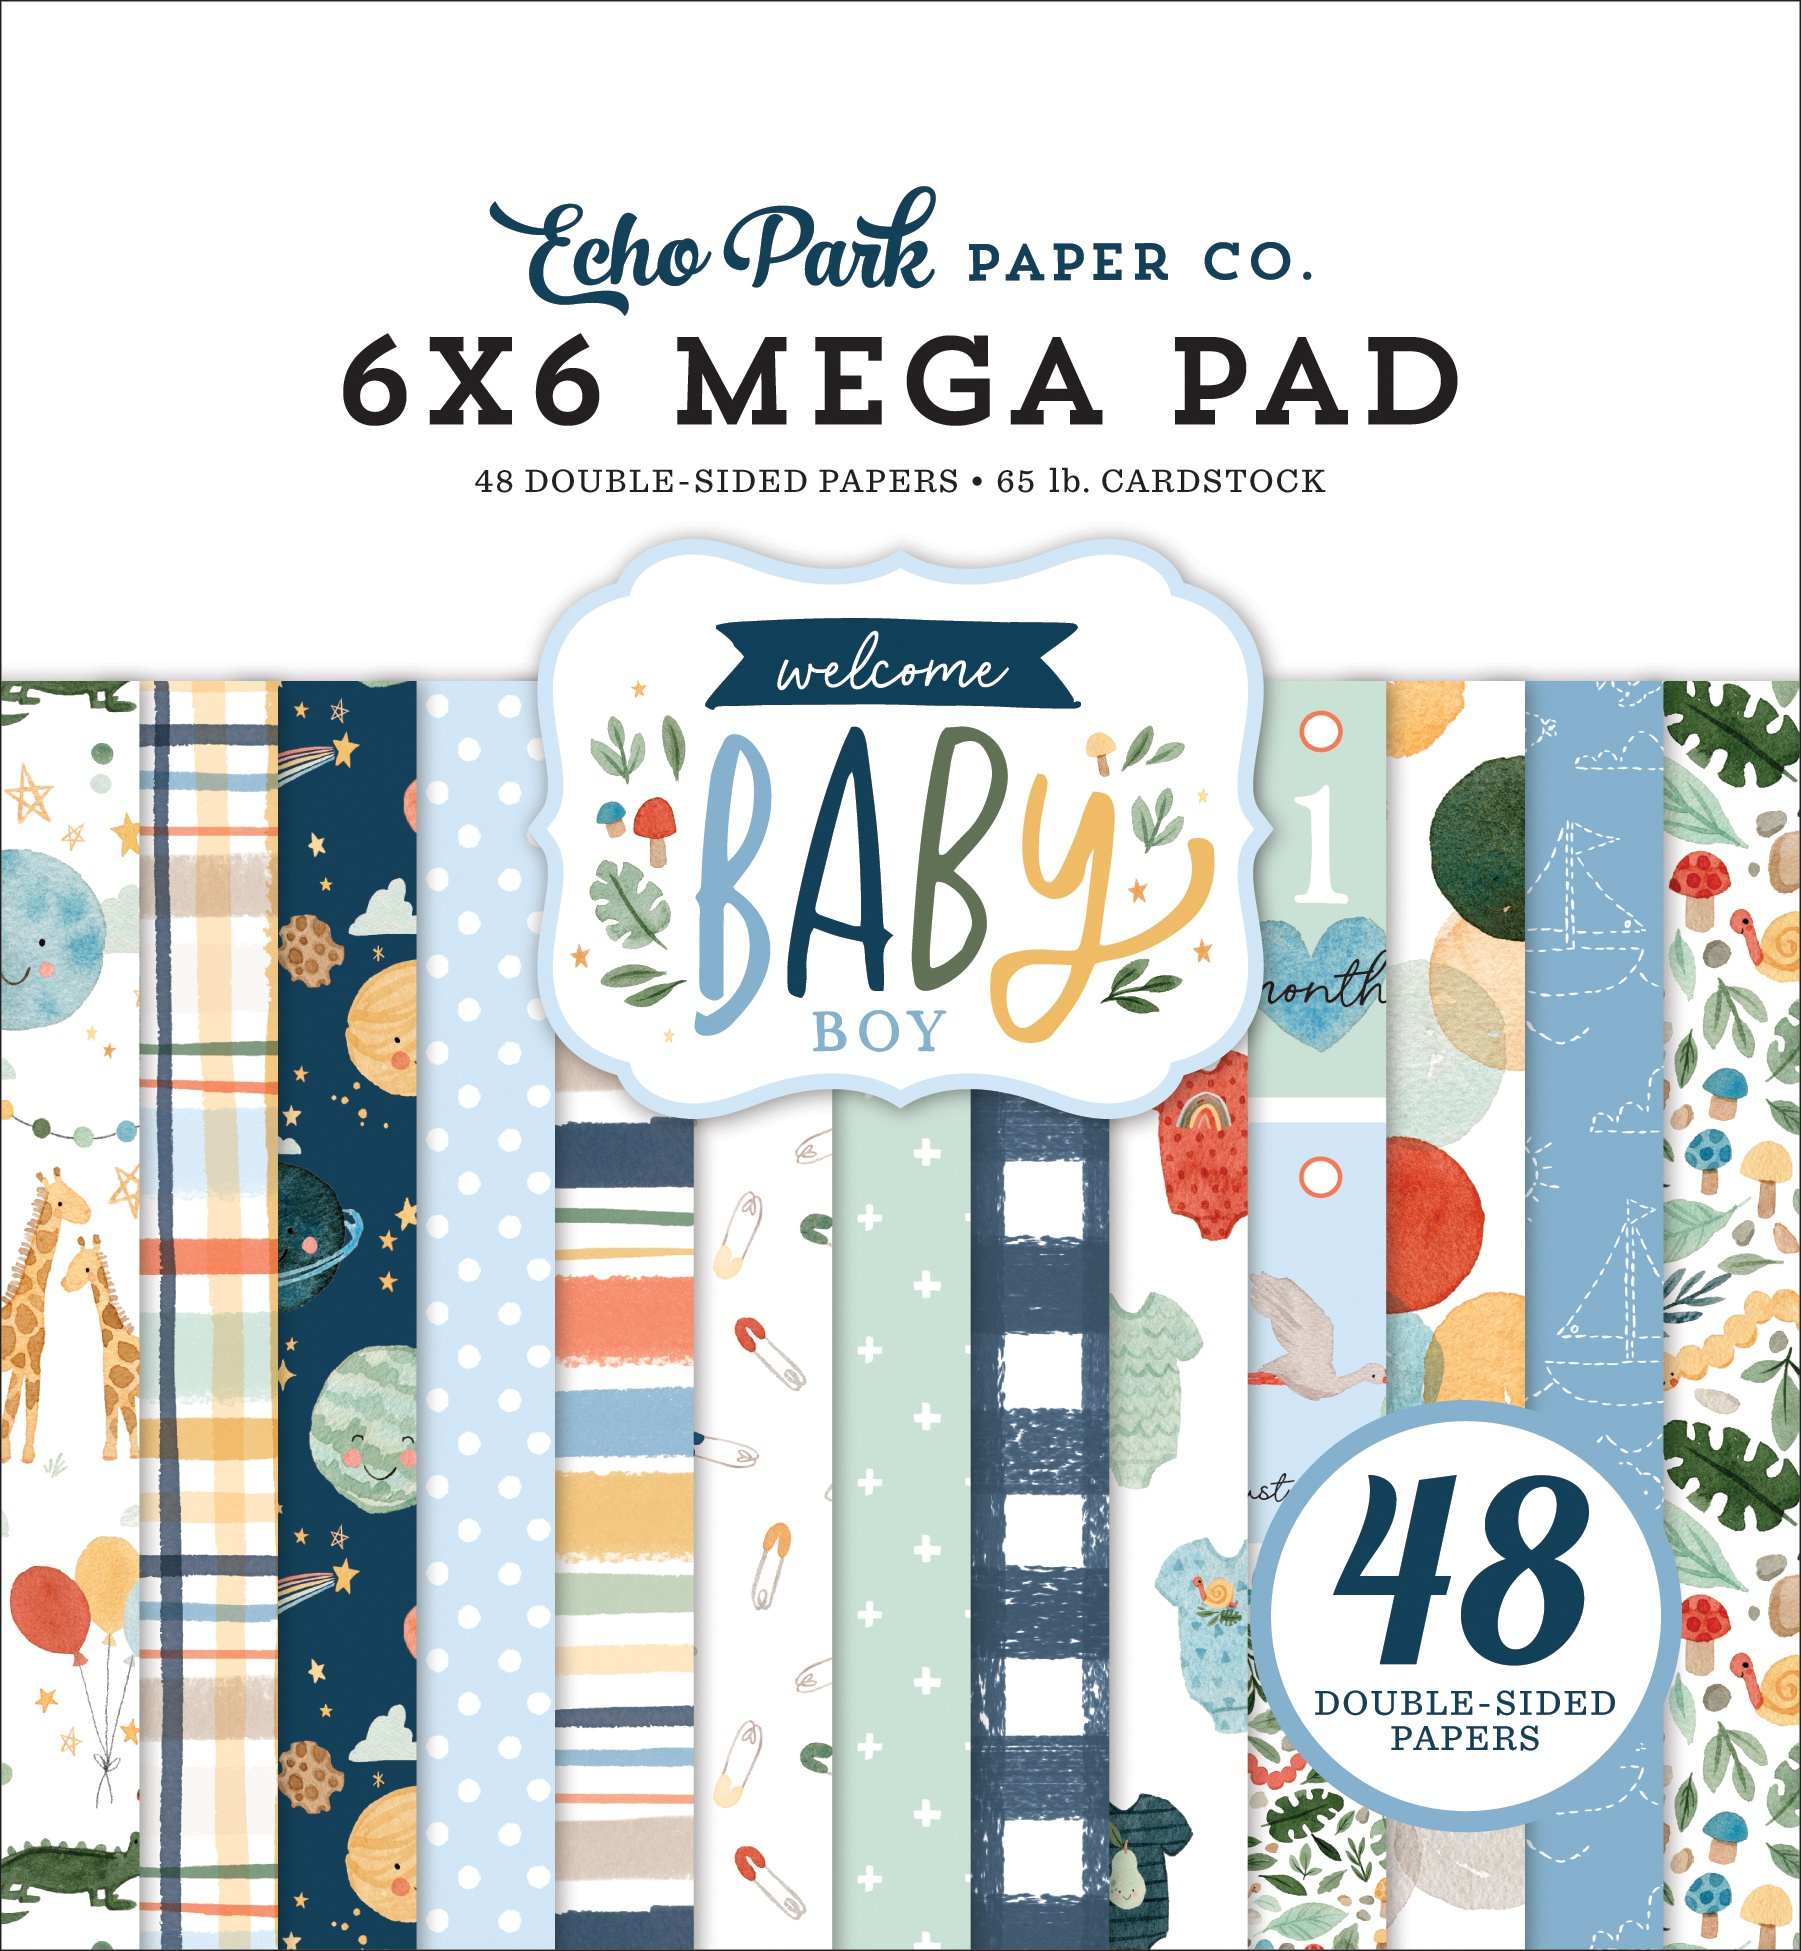 Echo Park - Welcome Baby Boy - 6x6 Mega Paper Pad